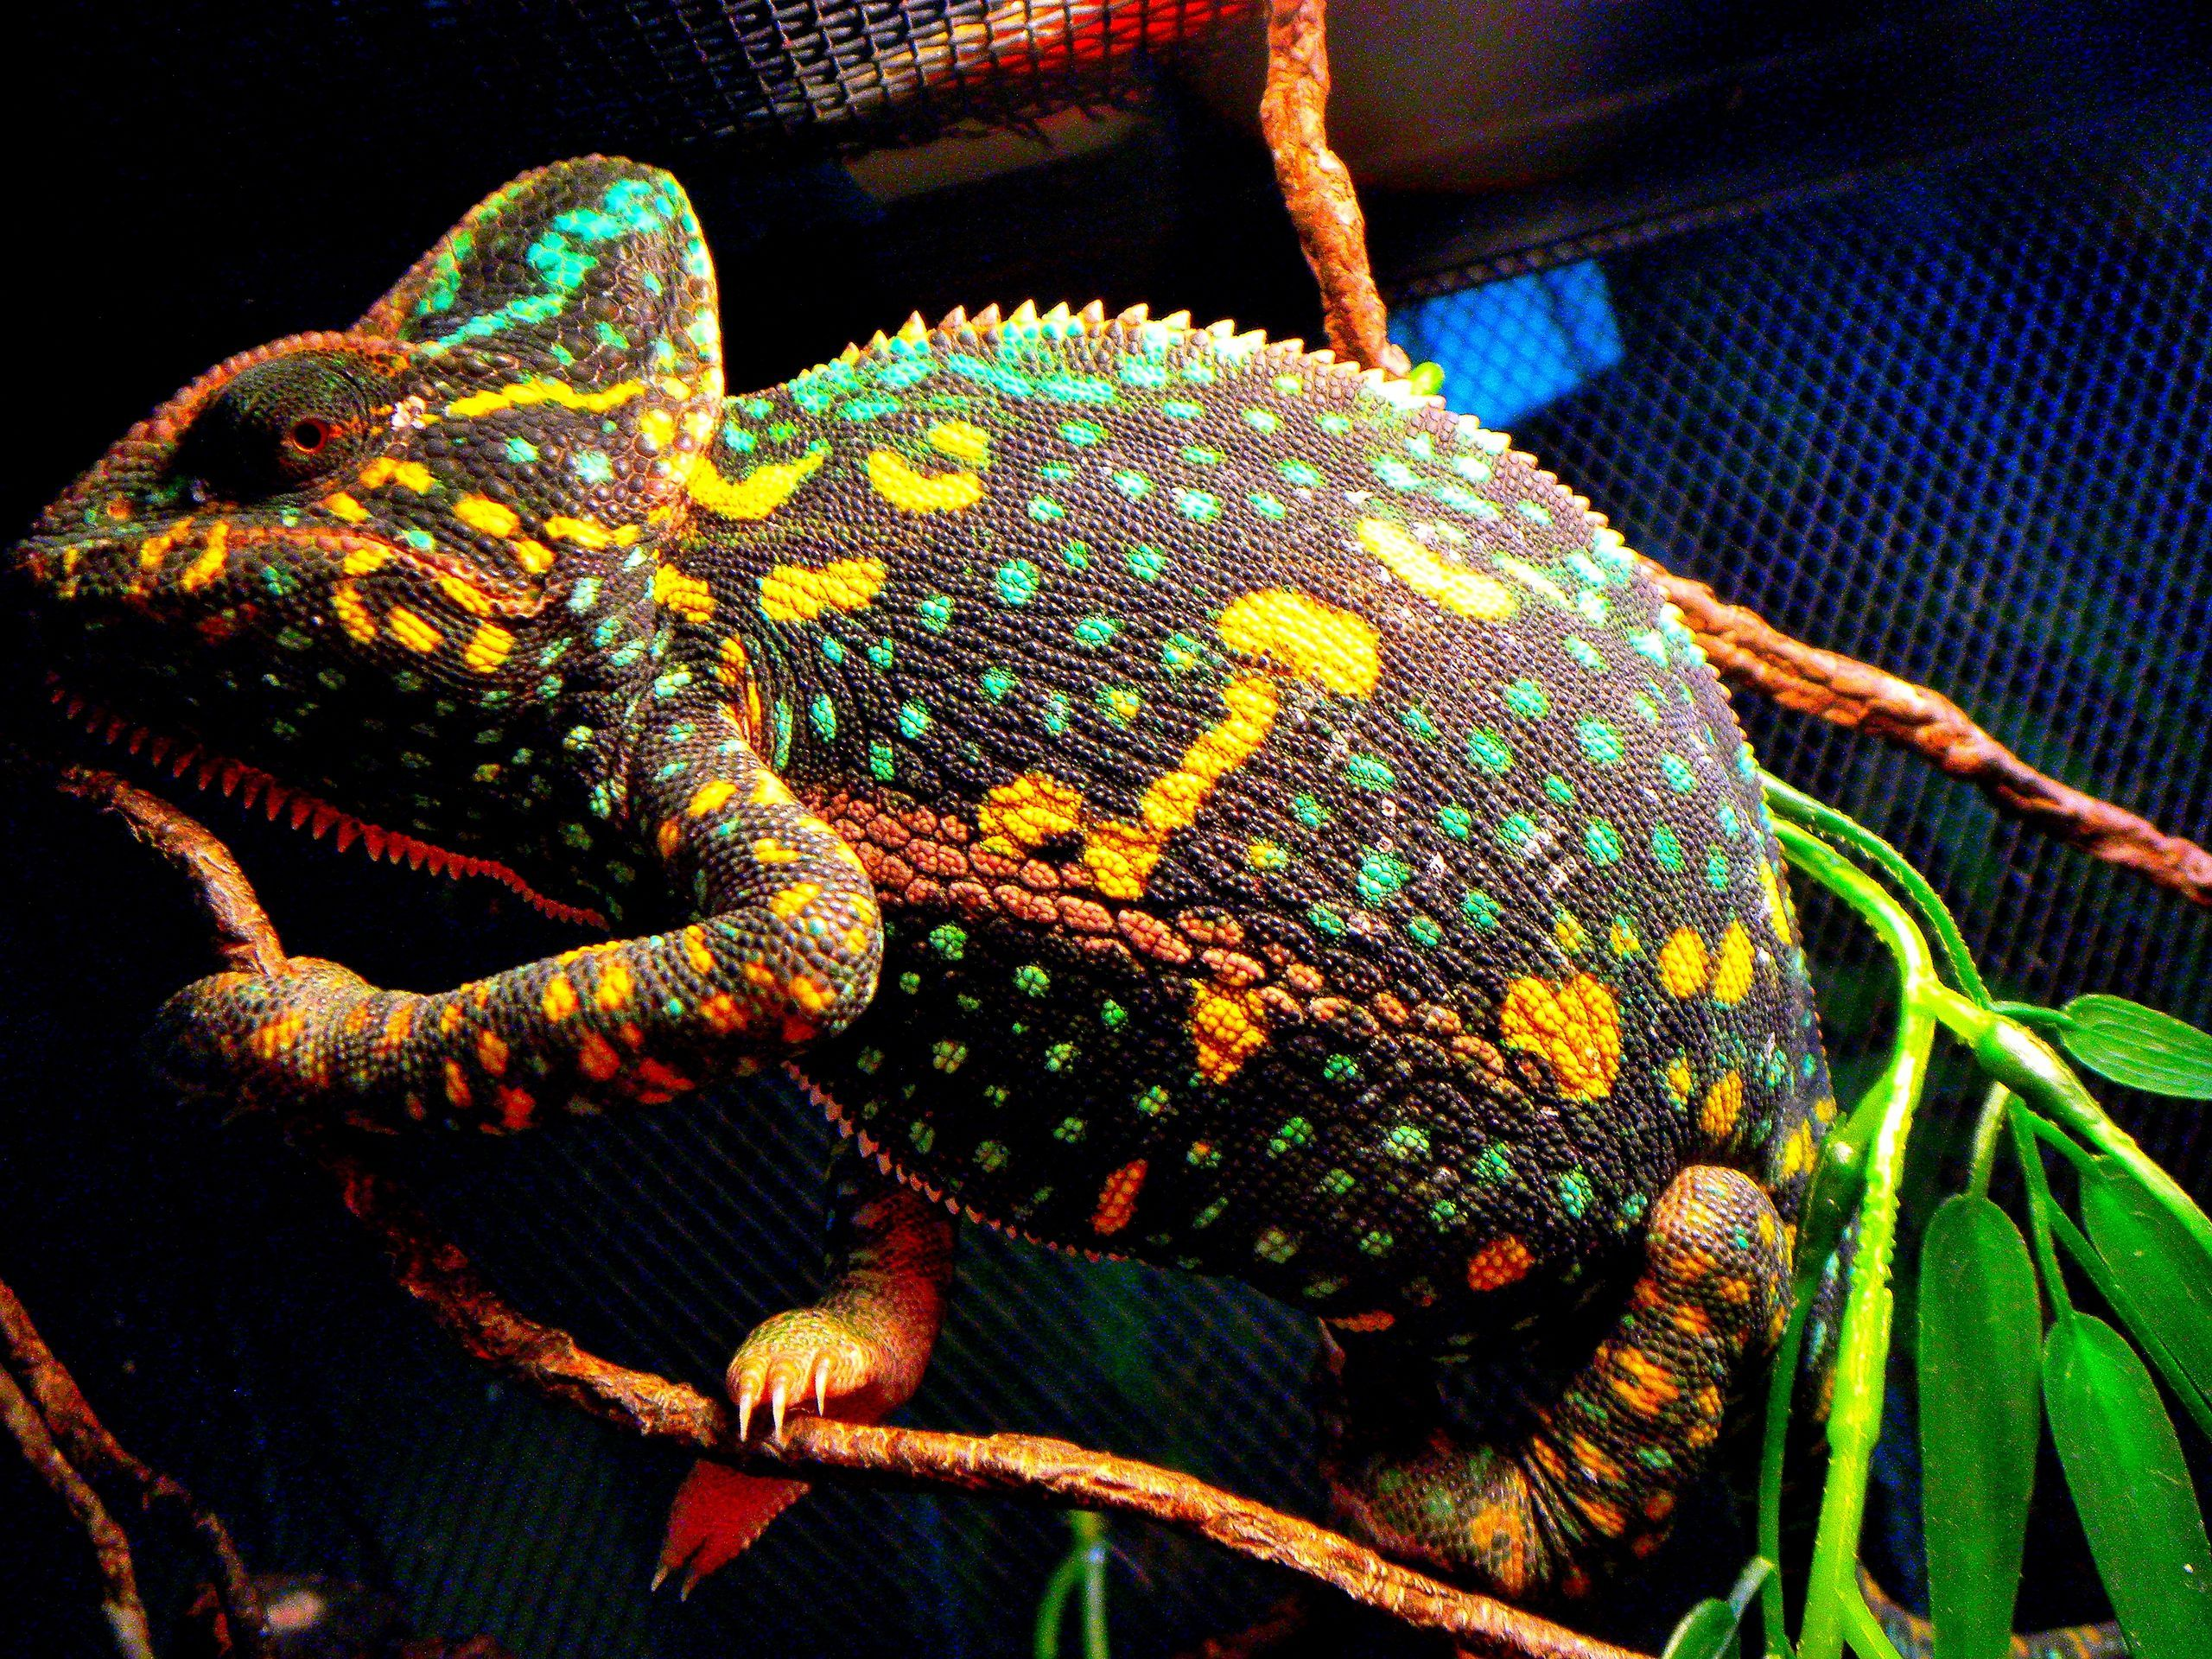 Female Veiled Chameleon NonReceptive yet Beautiful Colors